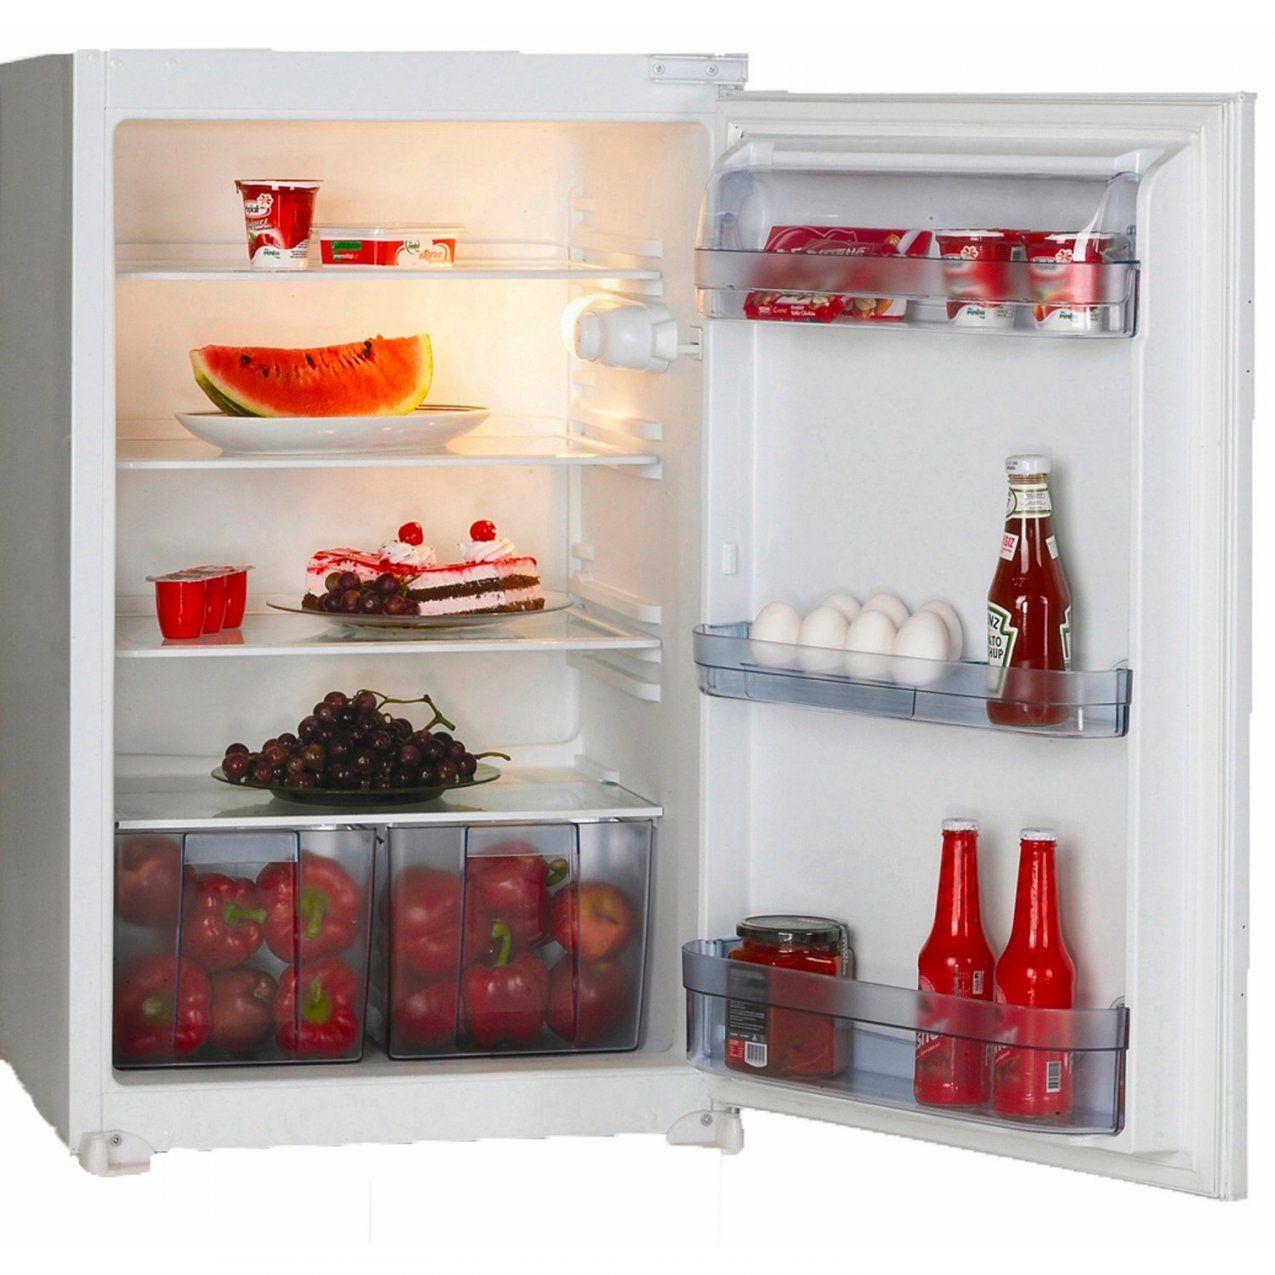 Respekta Einbaukühlschrank Eek A+ Ks 880 Kaufen Bei Obi von Einbaukühlschrank Bei Media Markt Bild